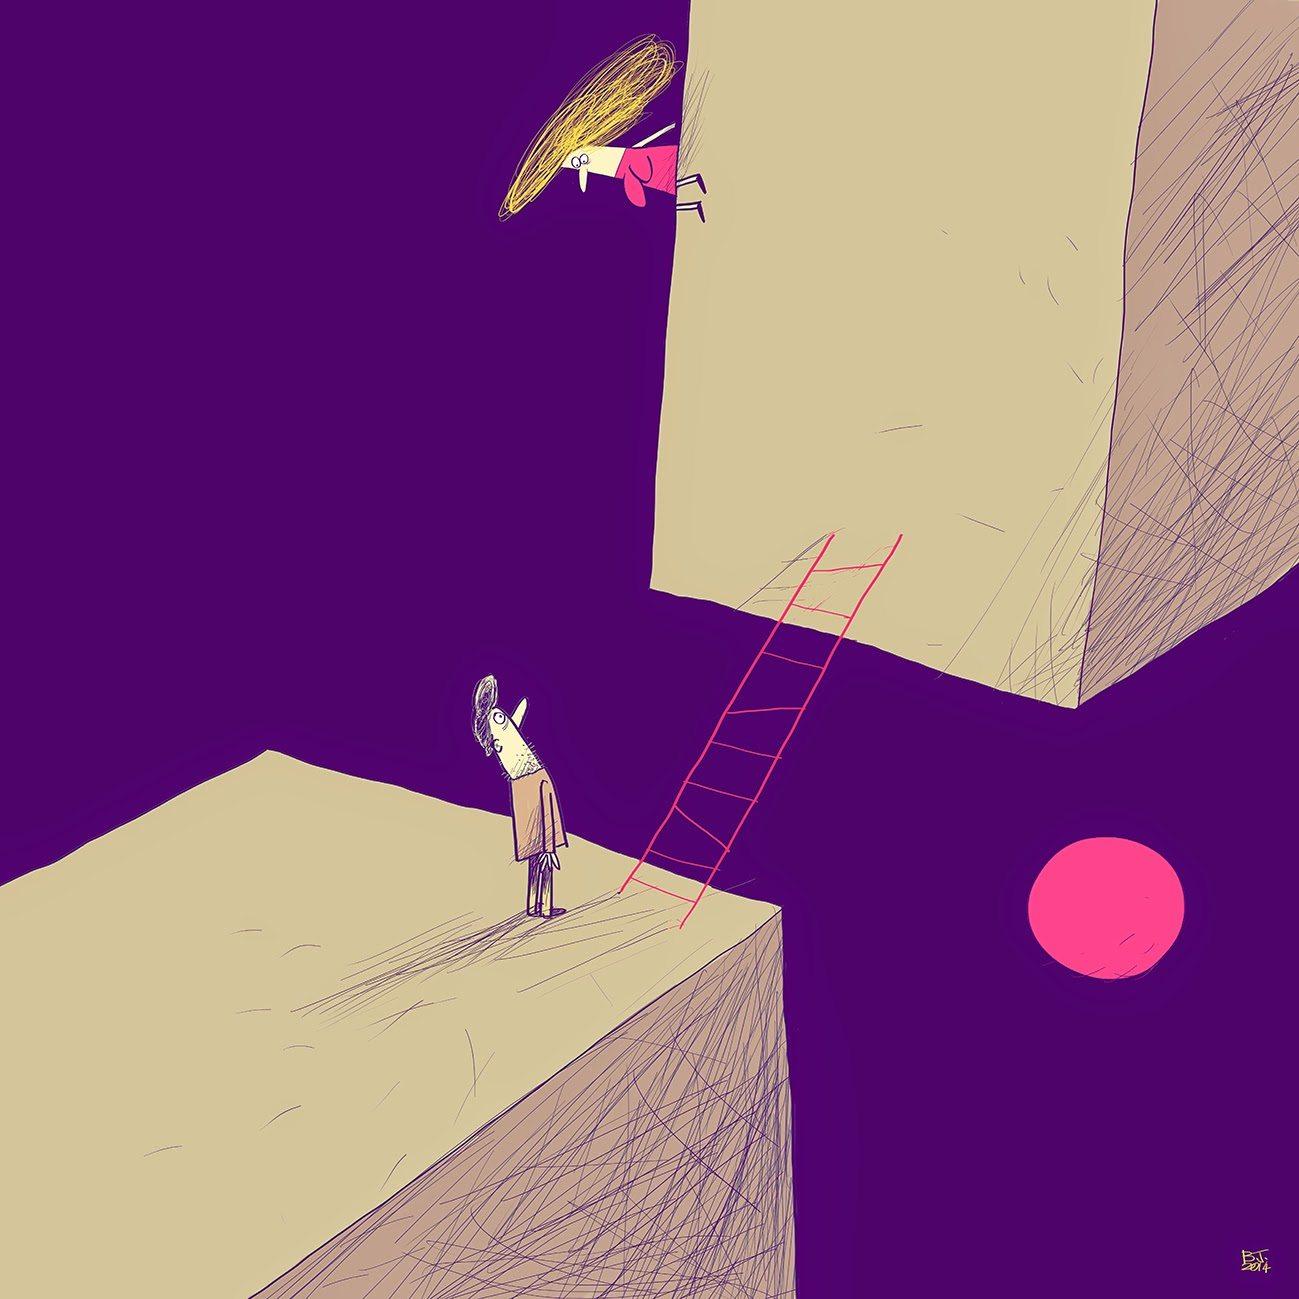 Artist of the Day: Bahij Jaroudi